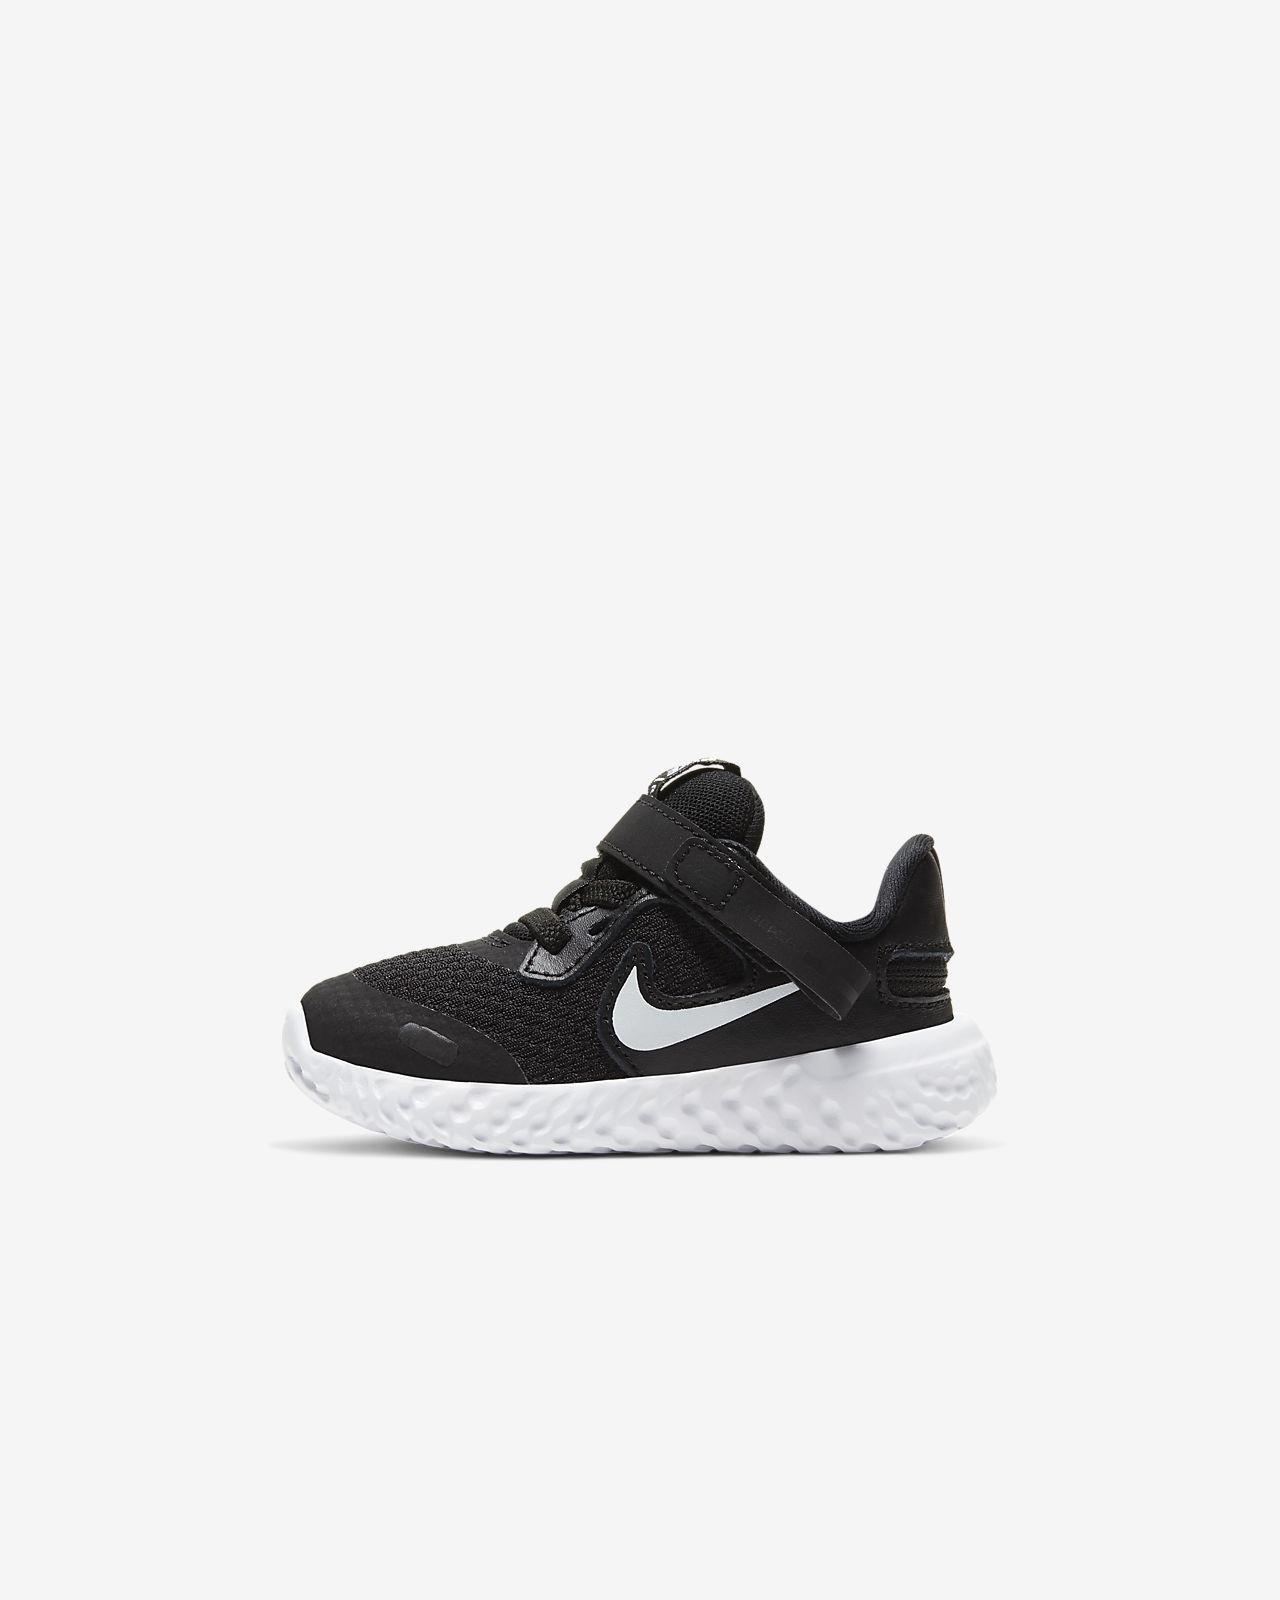 Nike Revolution 5 FlyEase Zapatillas Bebé e infantil